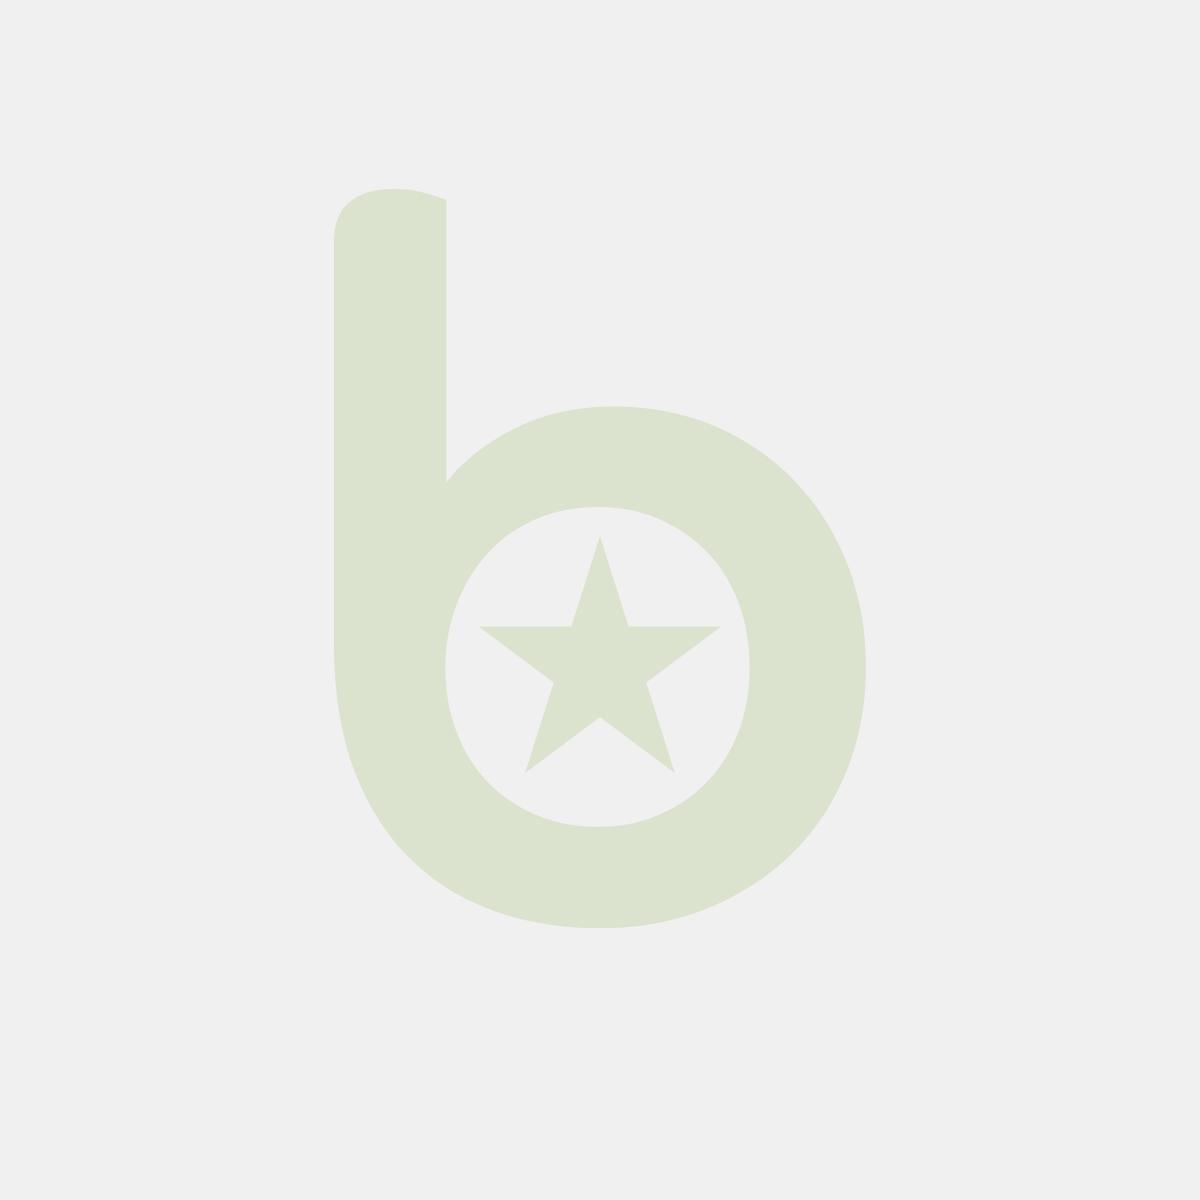 Bloczek samoprzylepny POST-IT® Super sticky Z-Notes (R330-6SS-RIO), 76x76mm, 6x90 kart., paleta Rio de Janeiro